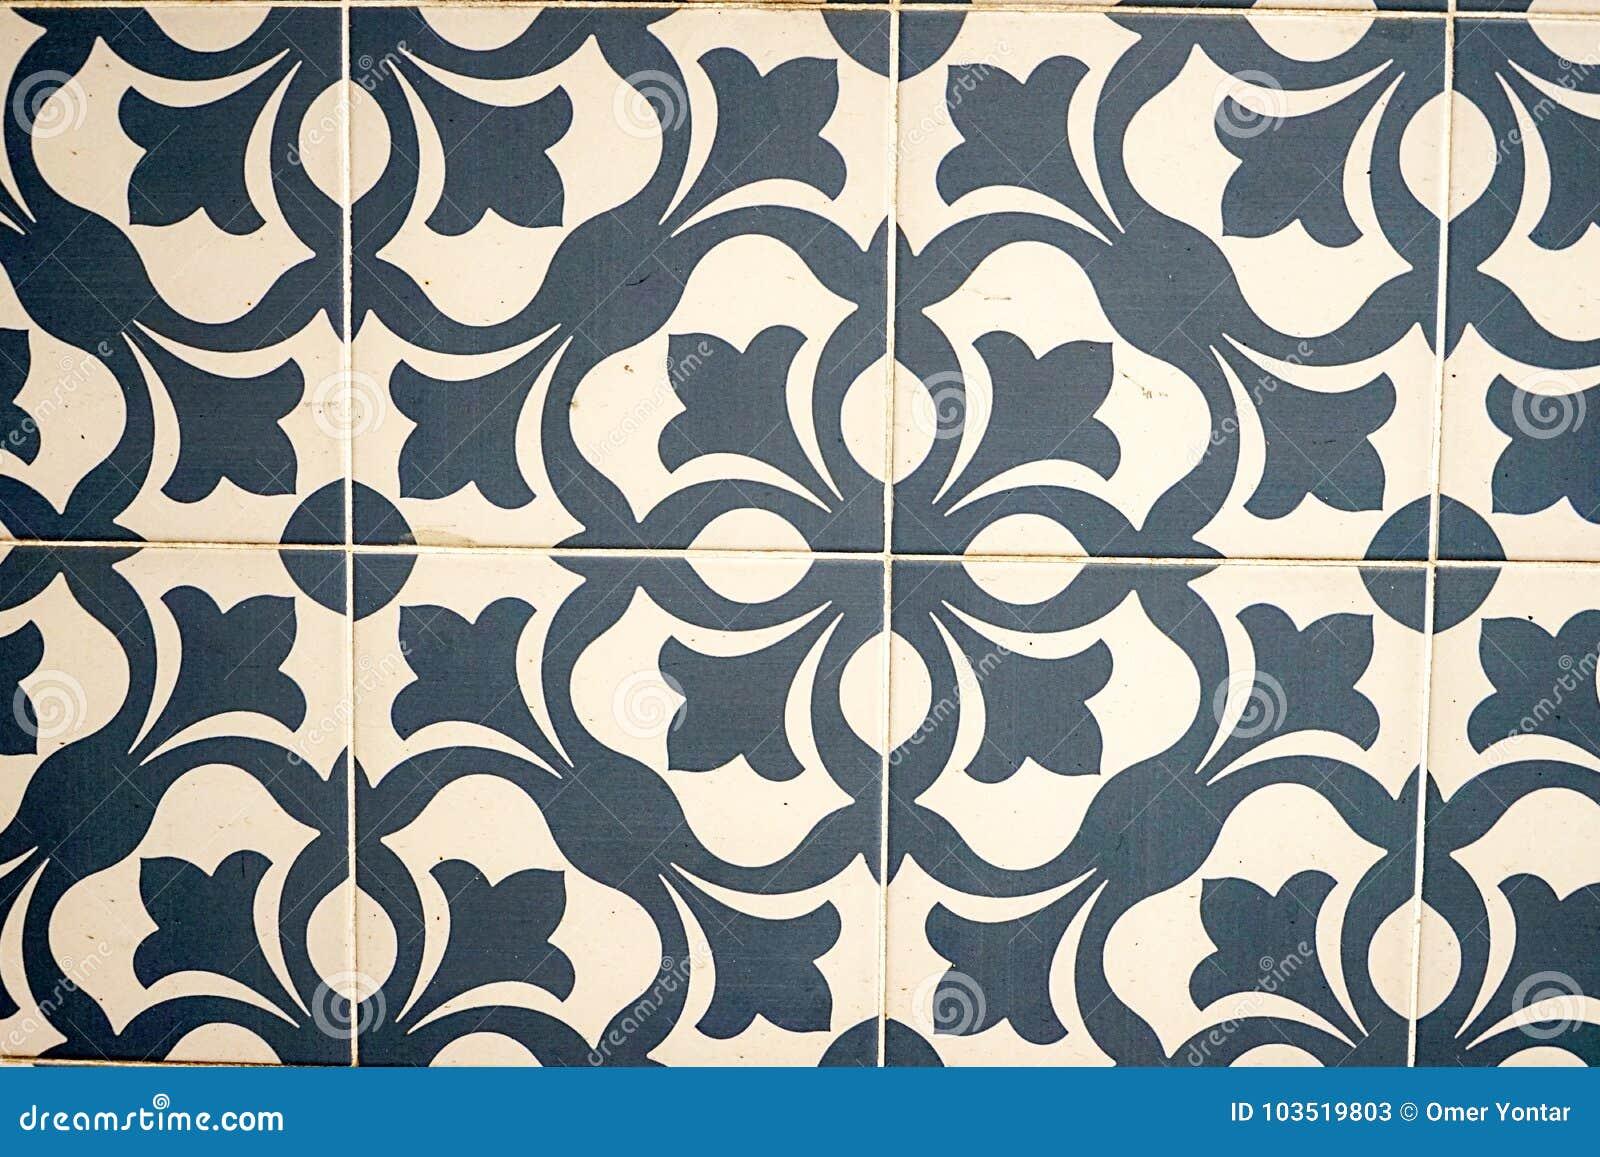 Symmetric Iconic Flower Patterns On Tiles Stock Image - Image of ...